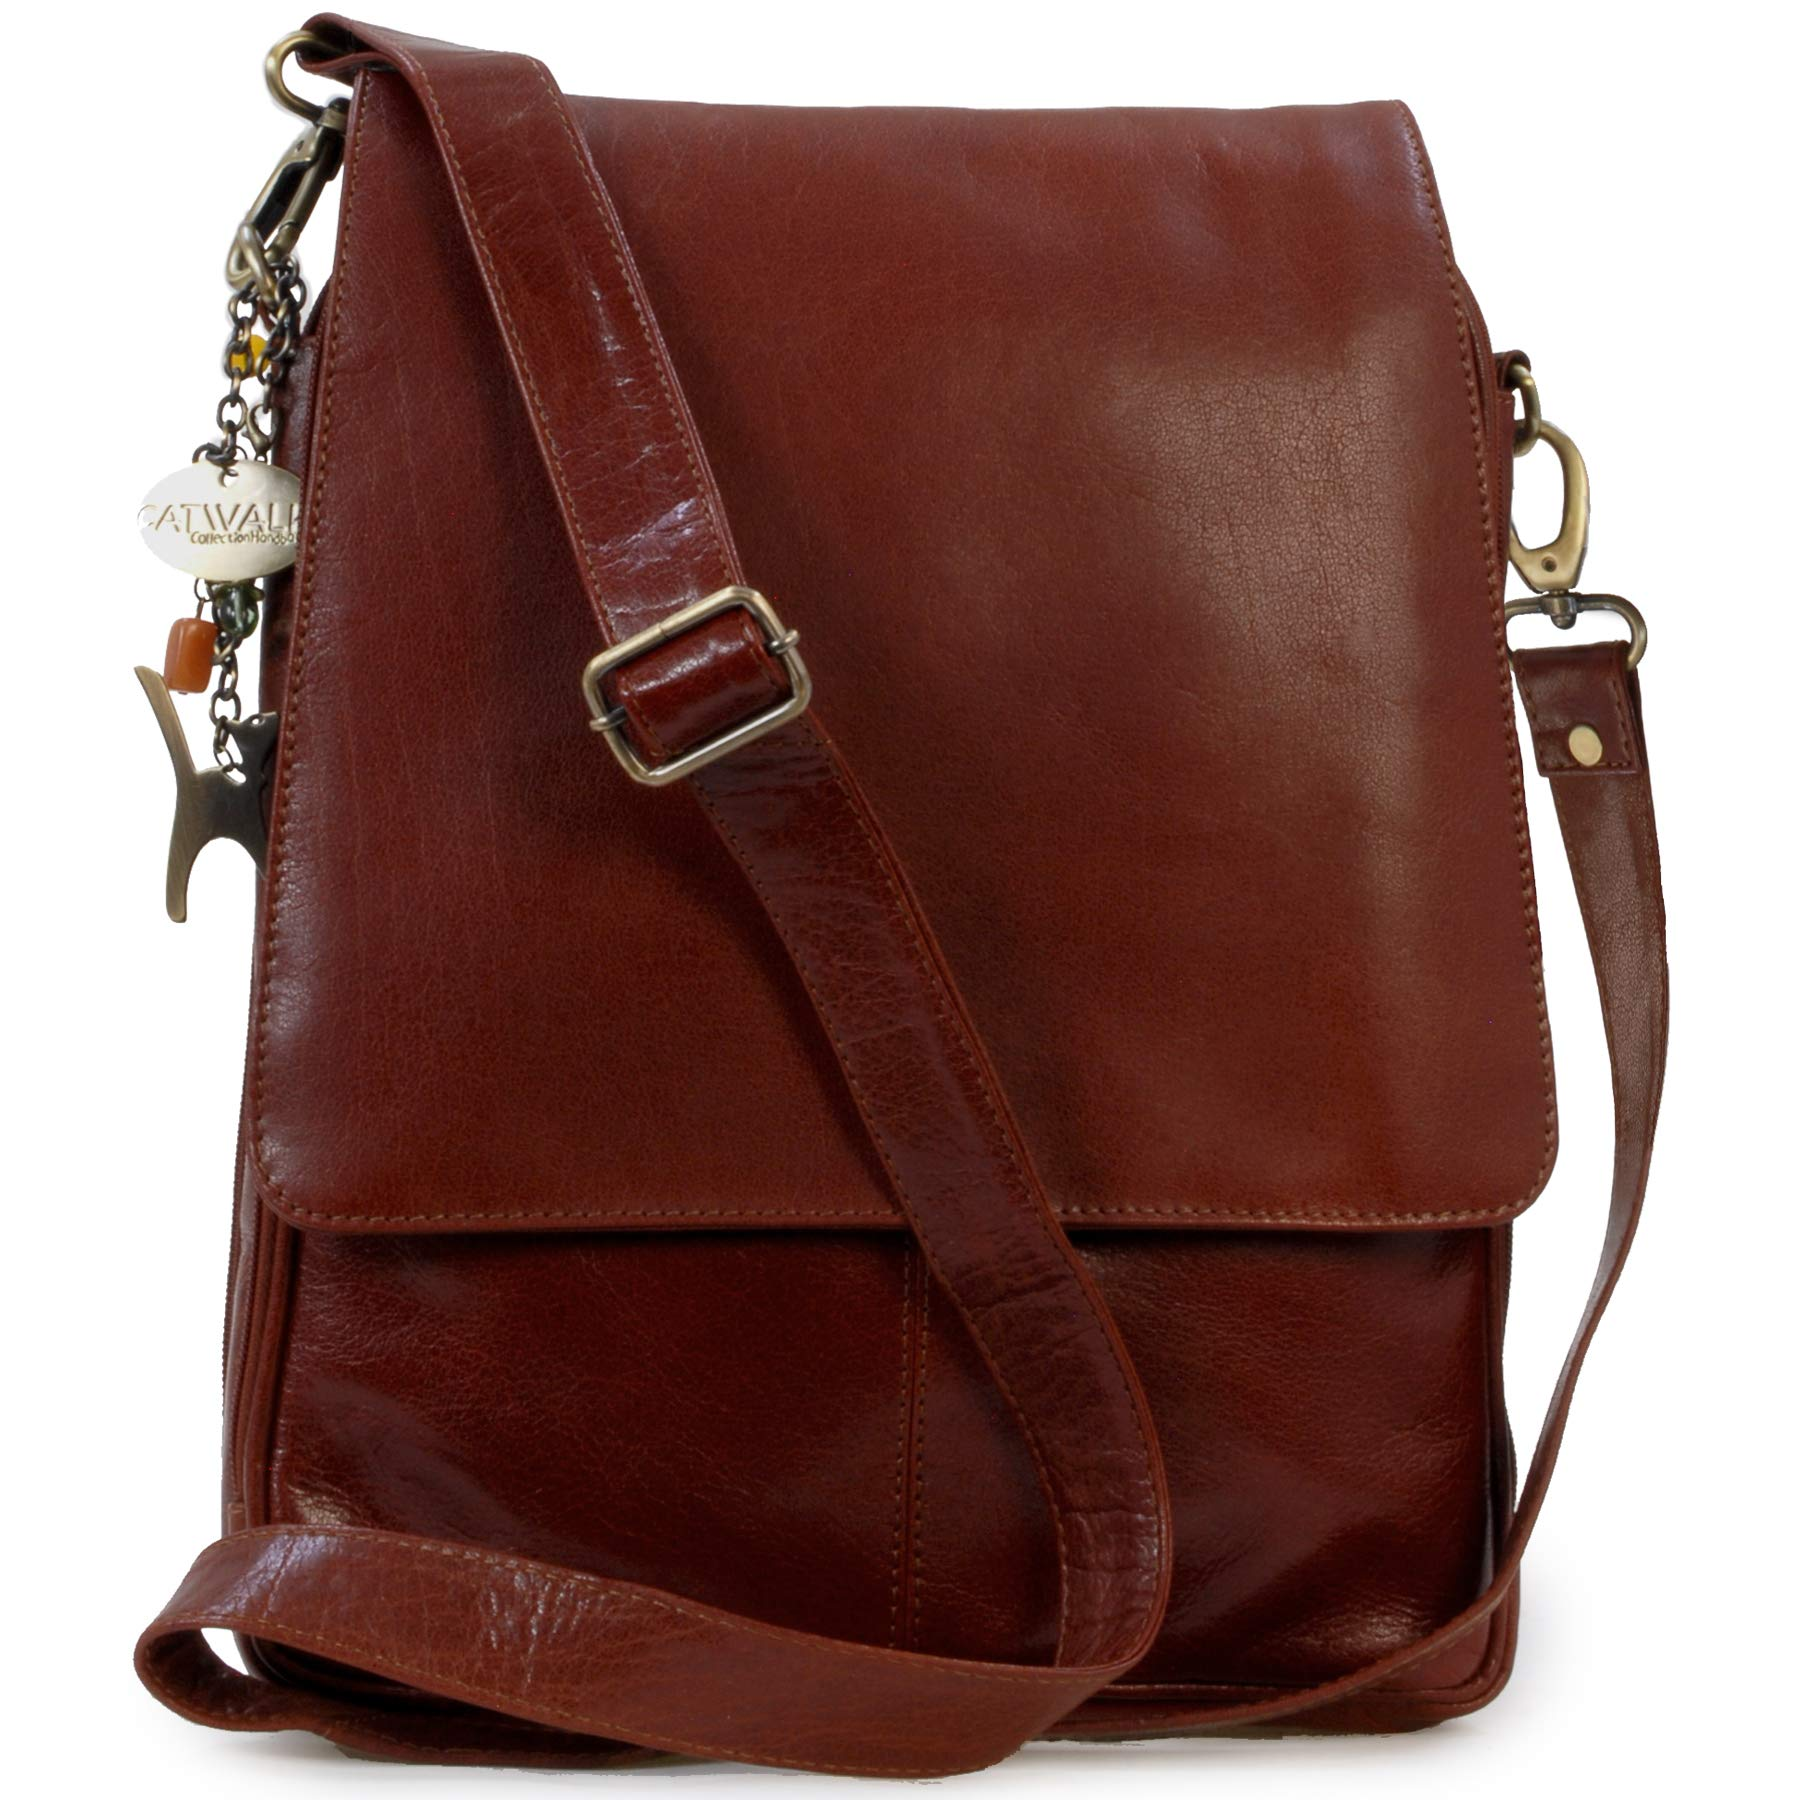 6351535cb7 High Quality Backpack Rucksack Lorenz Hand Luggage Work Cabin Doctor Flight  Bag